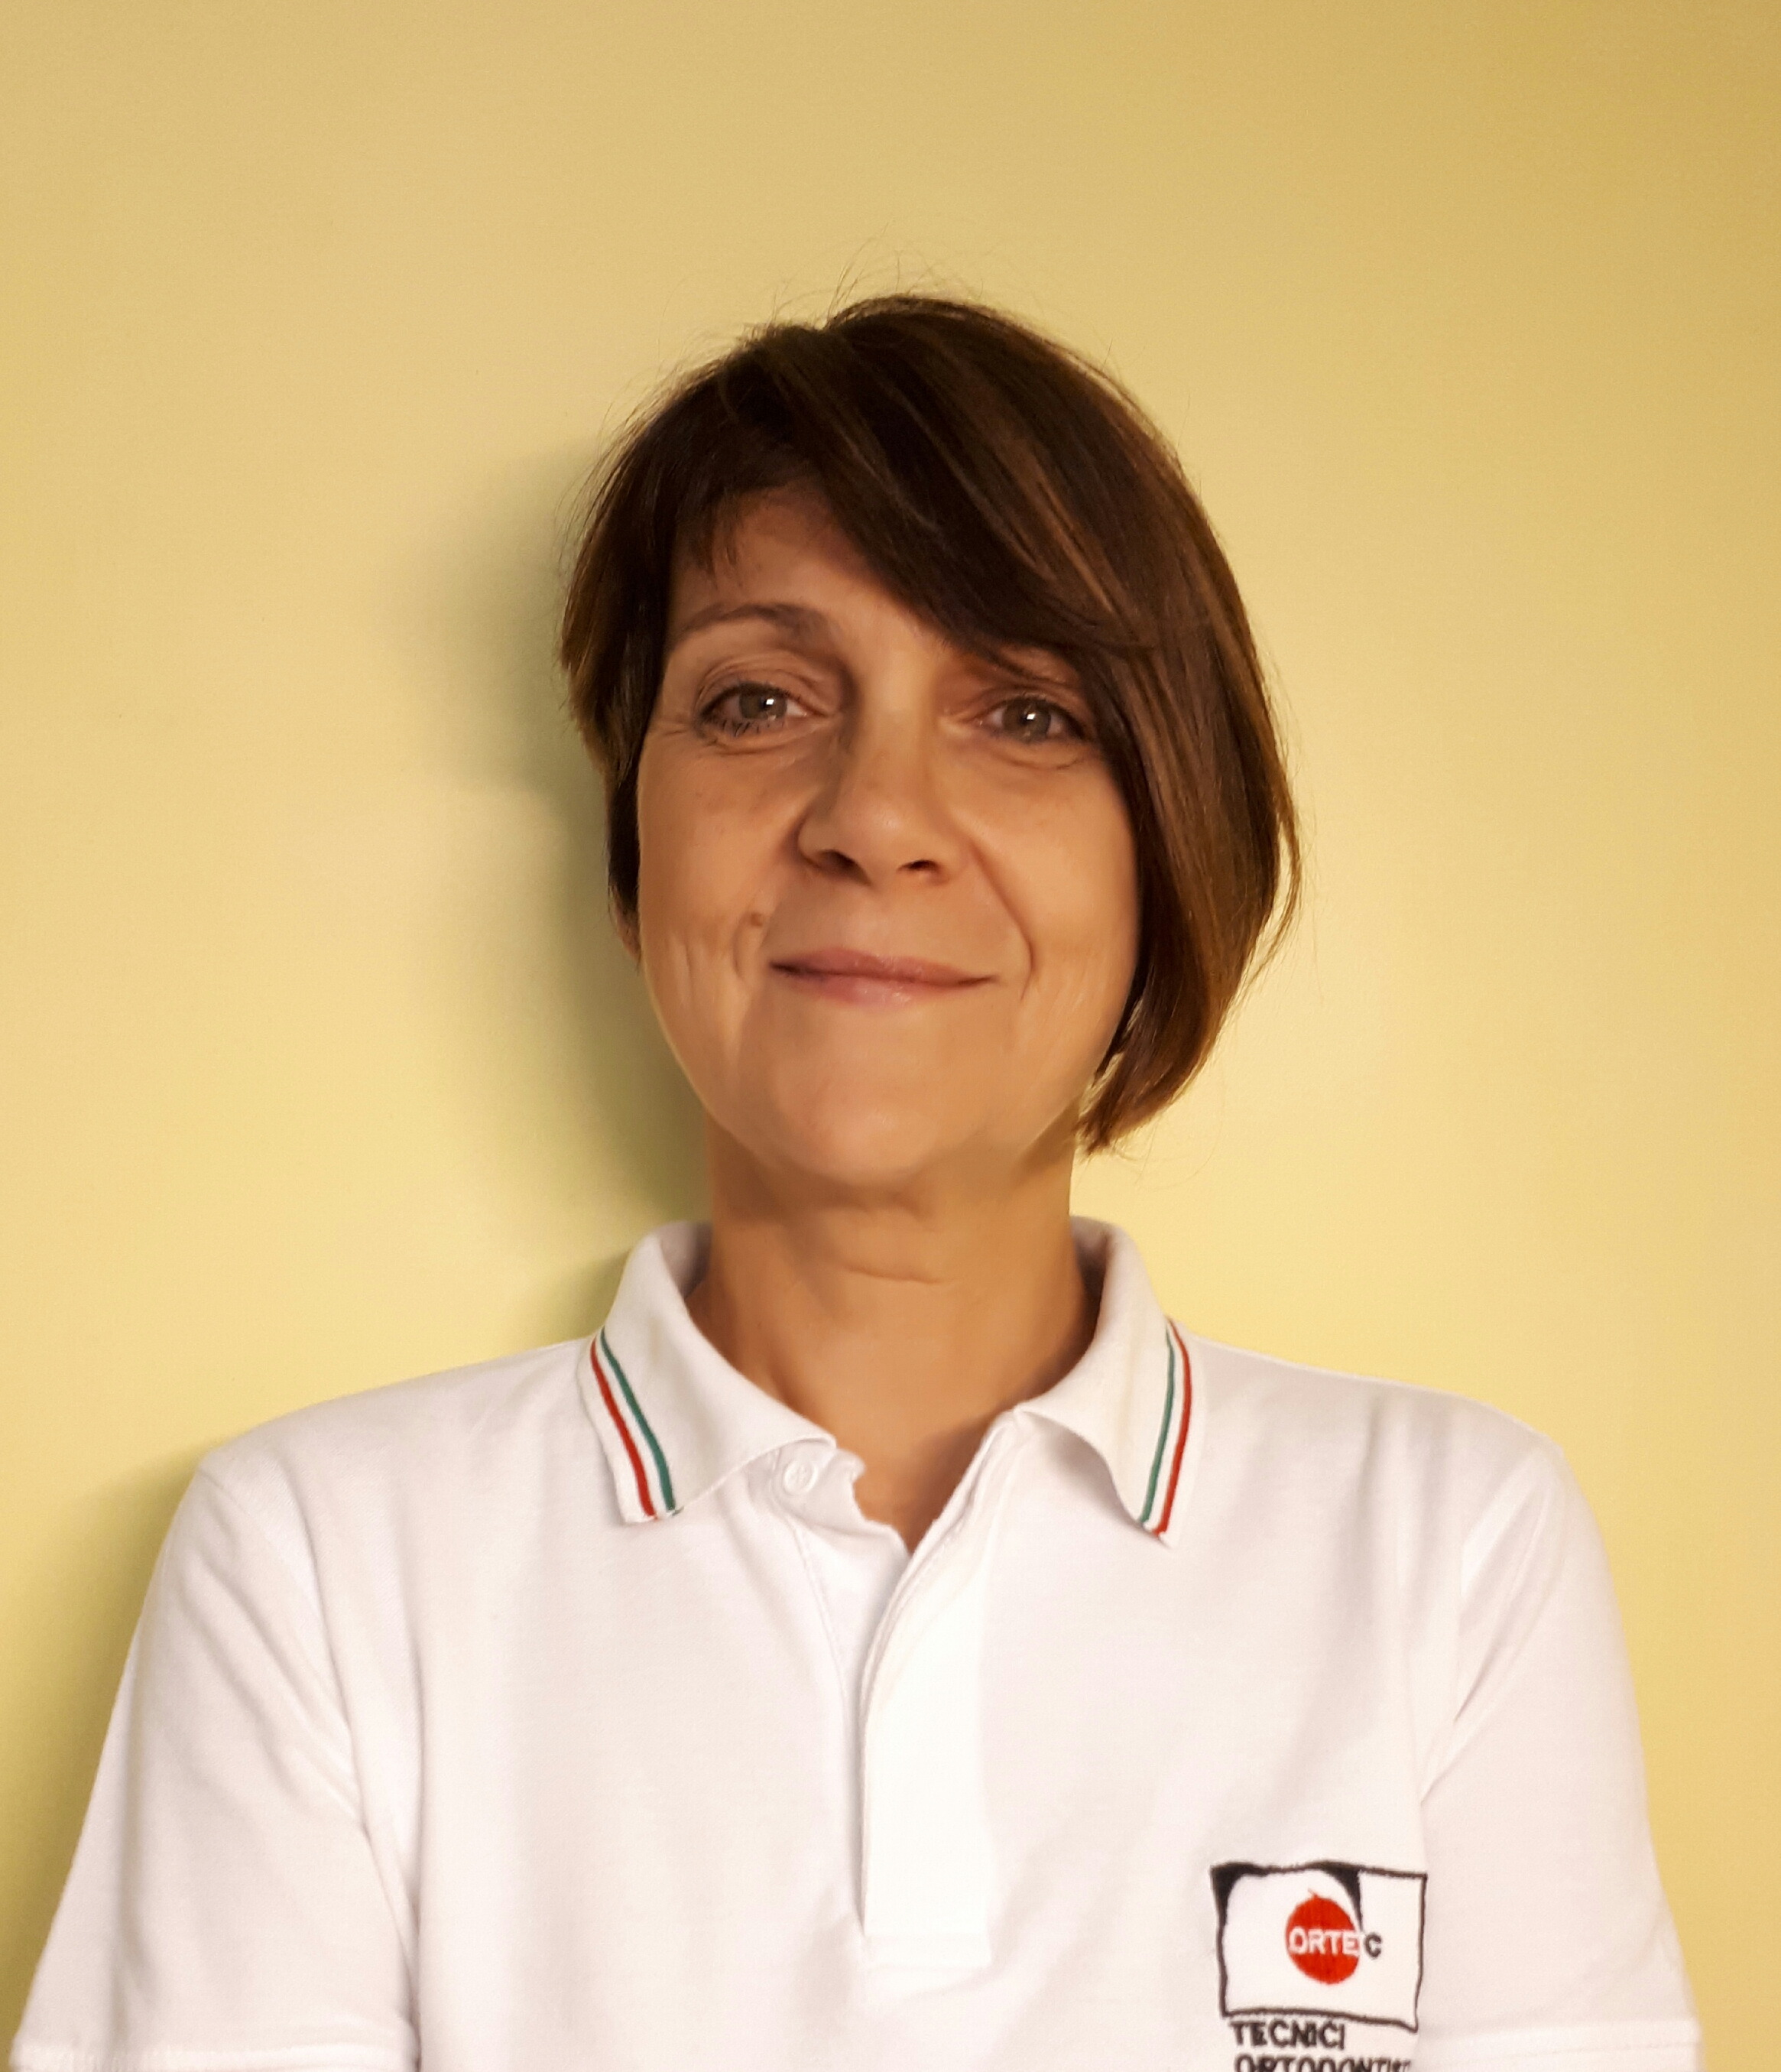 TROMBA  MANUELA - Socio Ortec